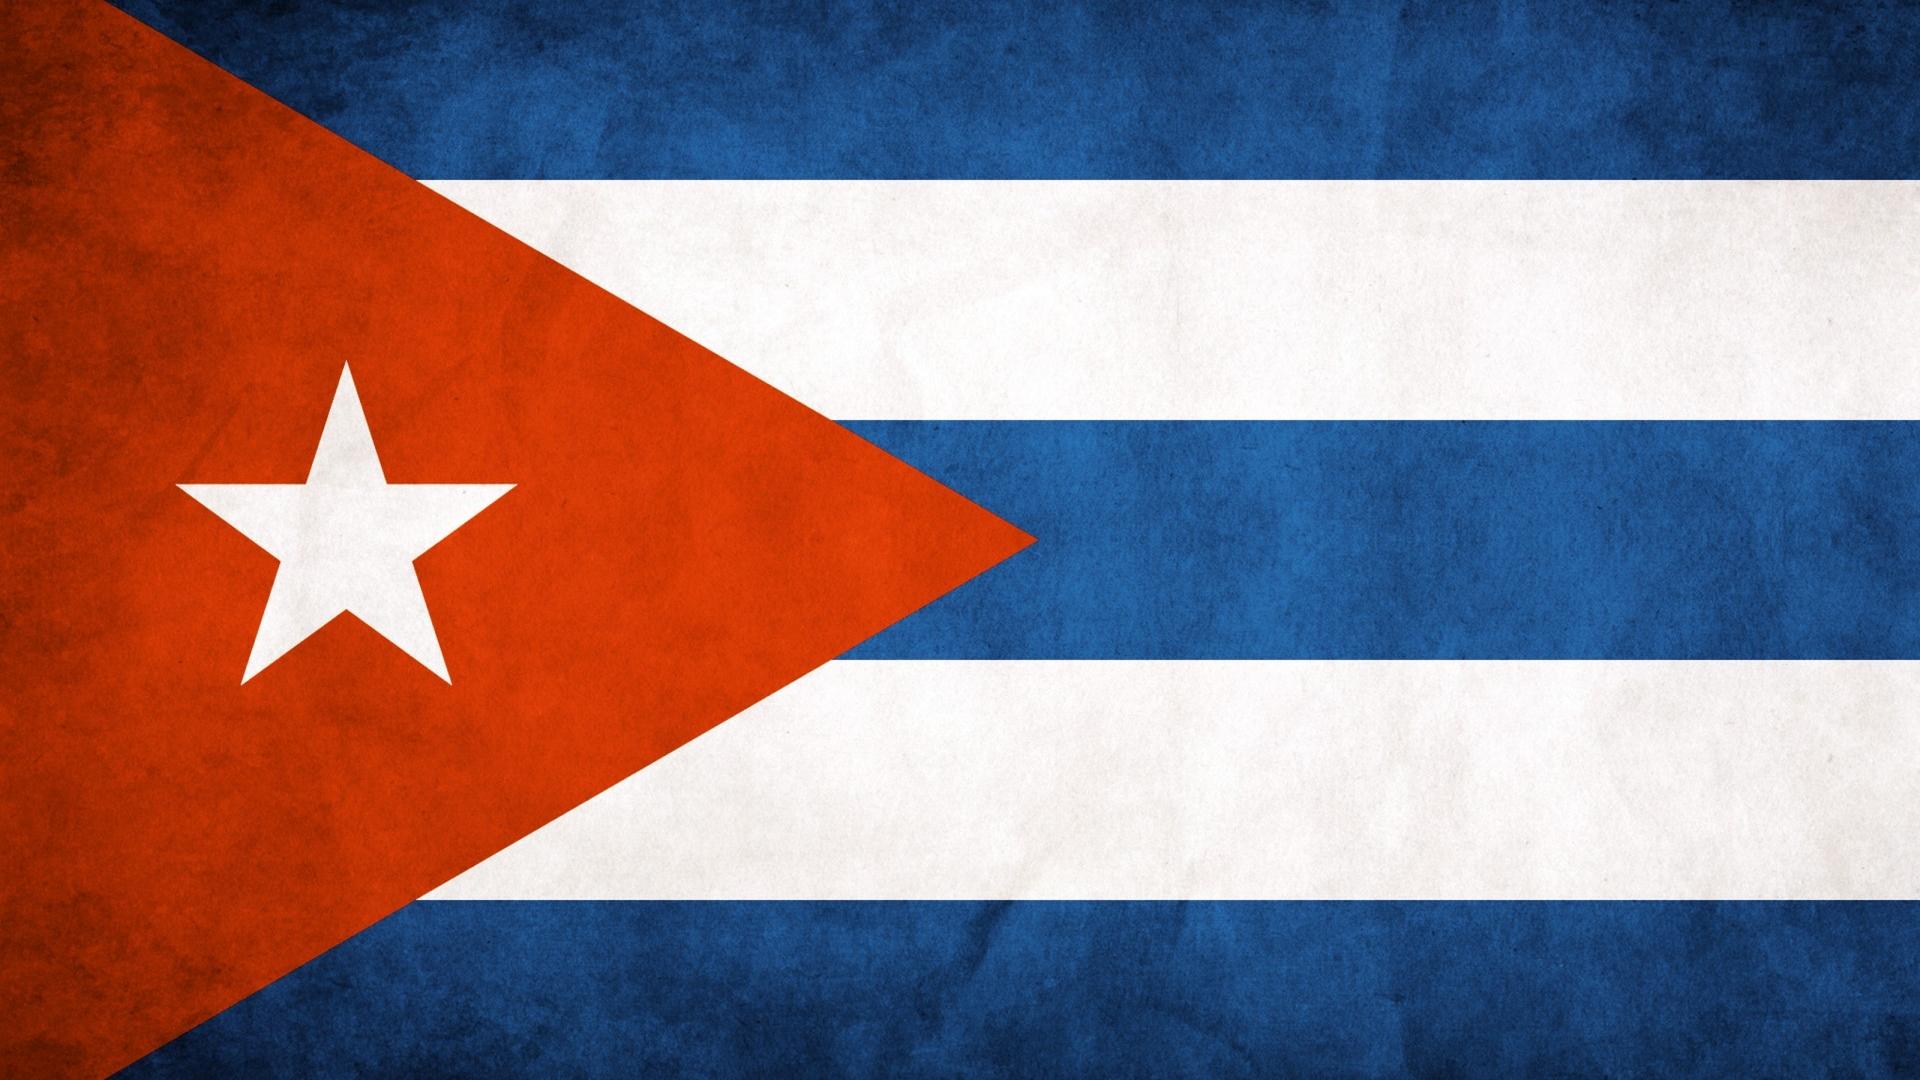 Desktop Wallpaper Hd Free Download For Windows 7 Cuba Wallpaper Hd Wallpapers